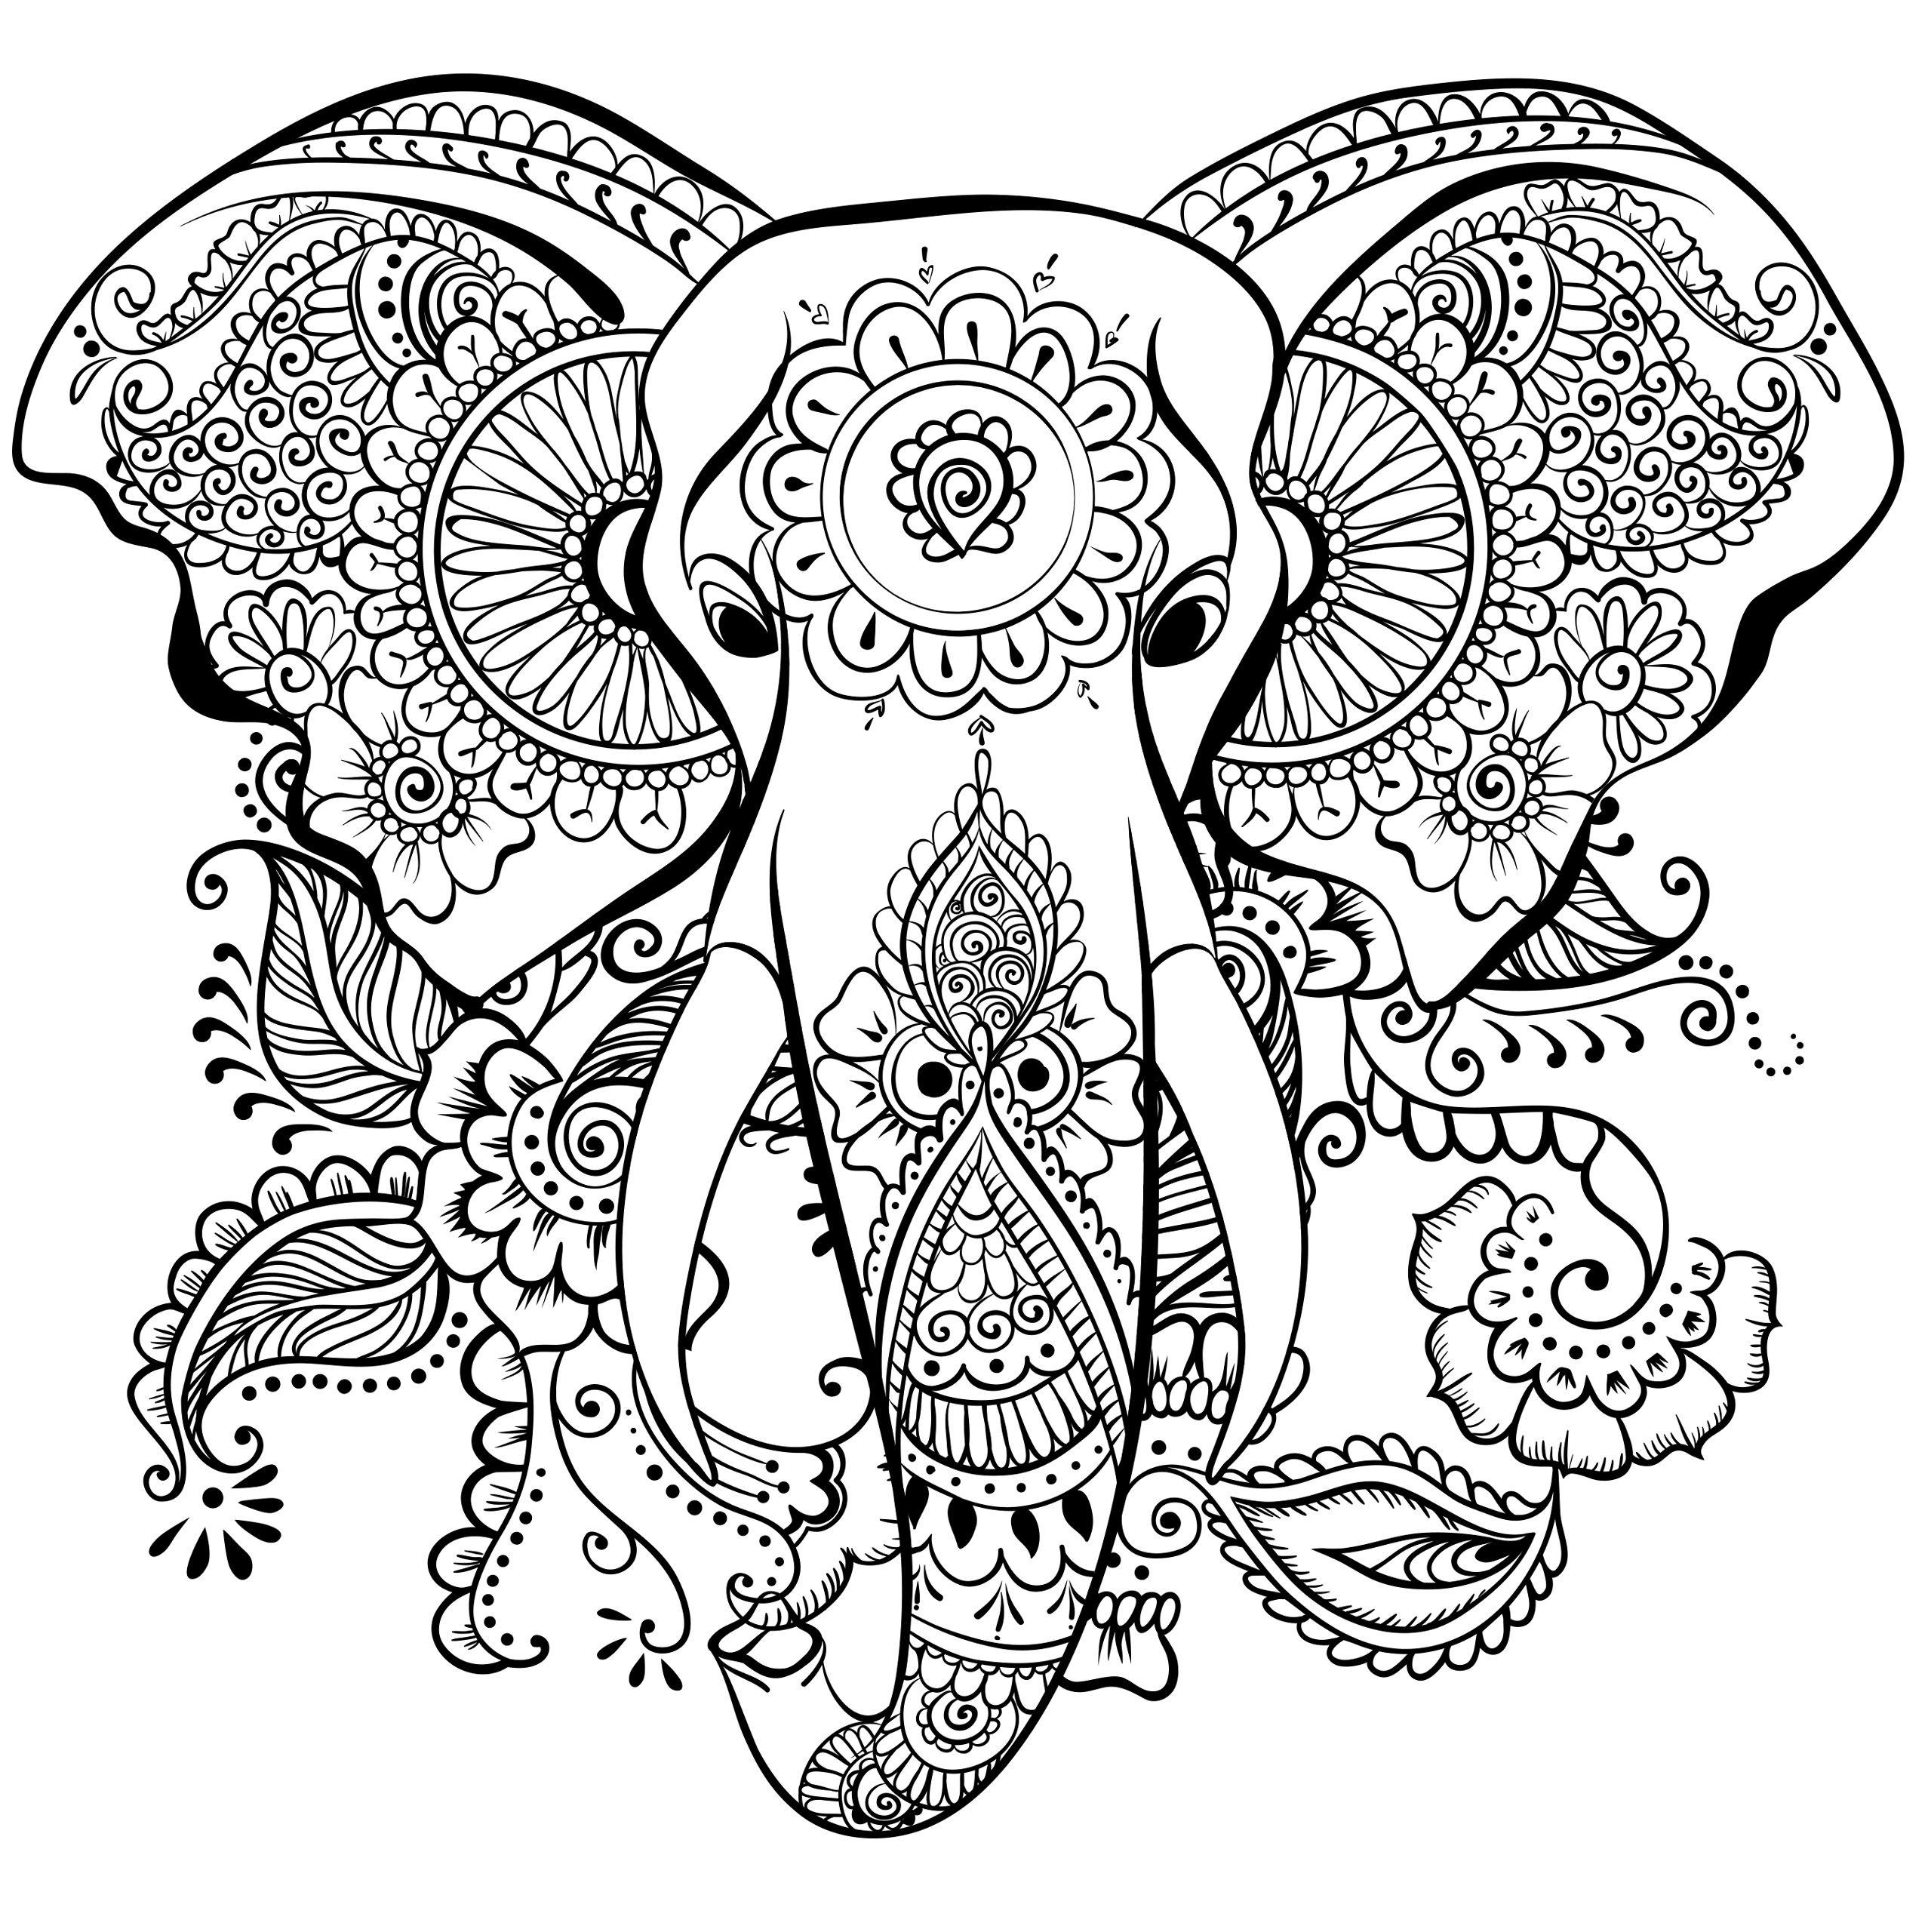 Elefantes | MANDALAS PARA COLOREAR | Mandala coloring pages, Adult